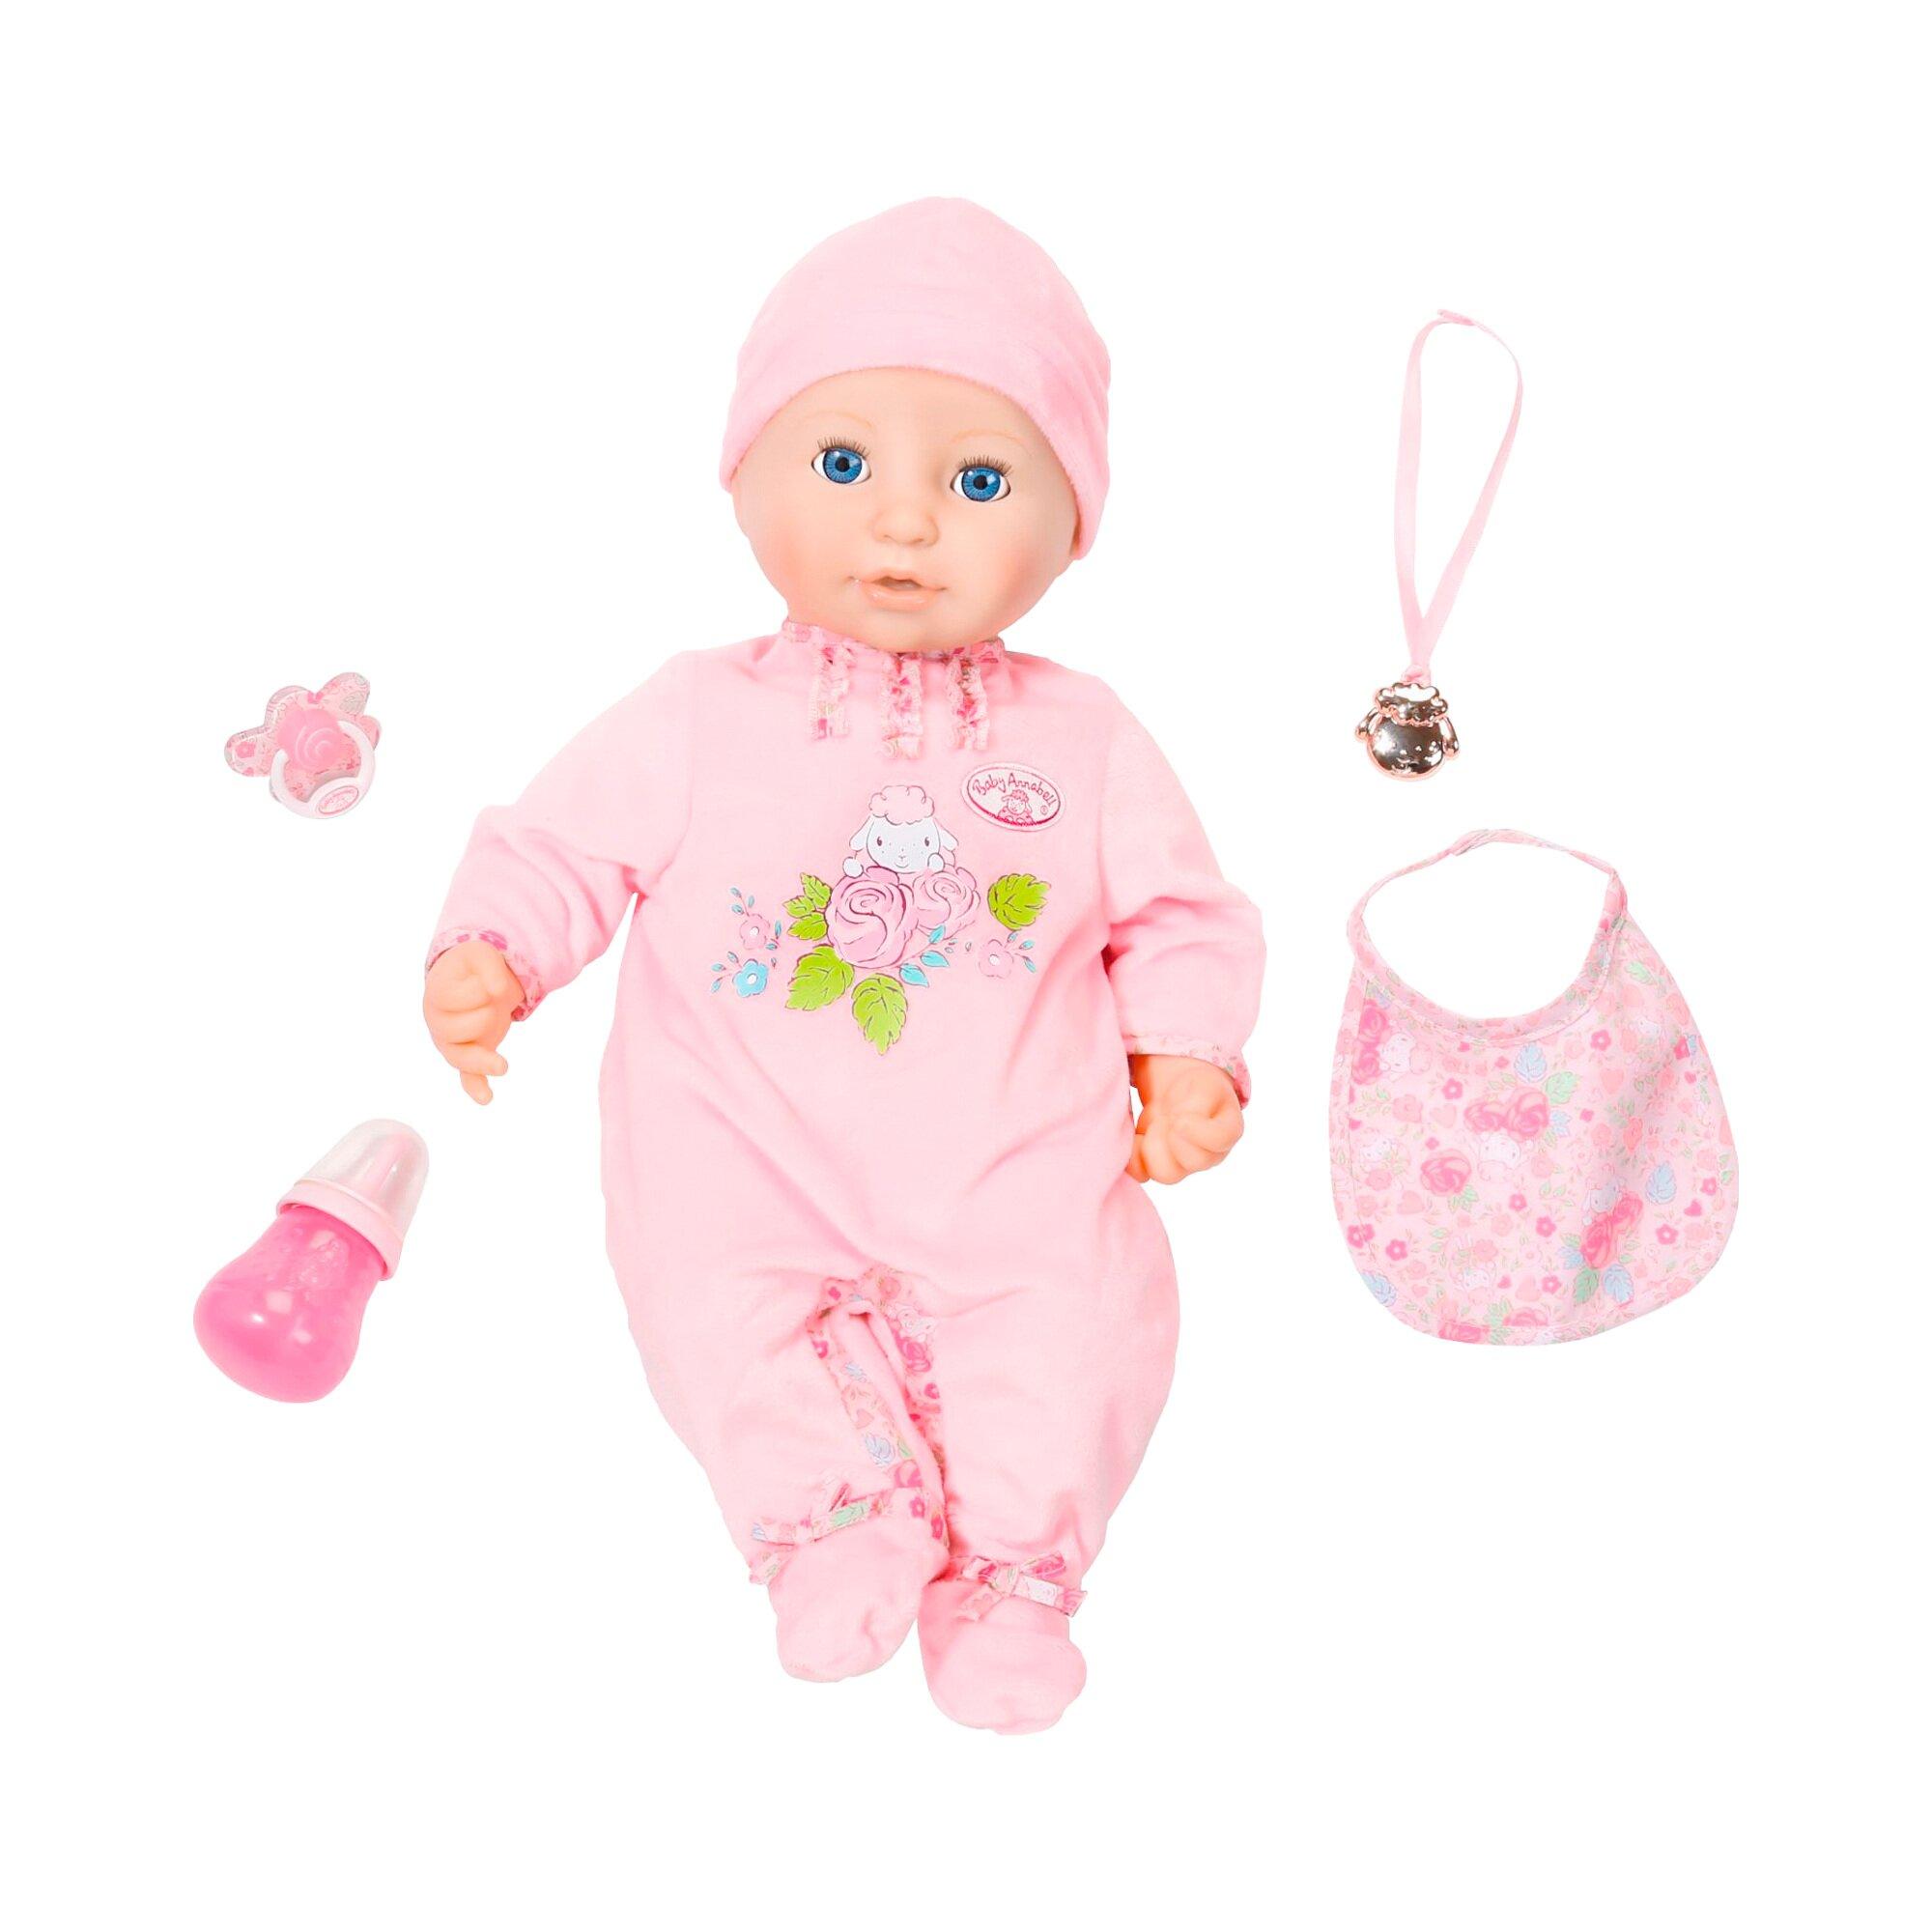 Baby Annabell Puppe Annabell mit Funktionen 43 cm